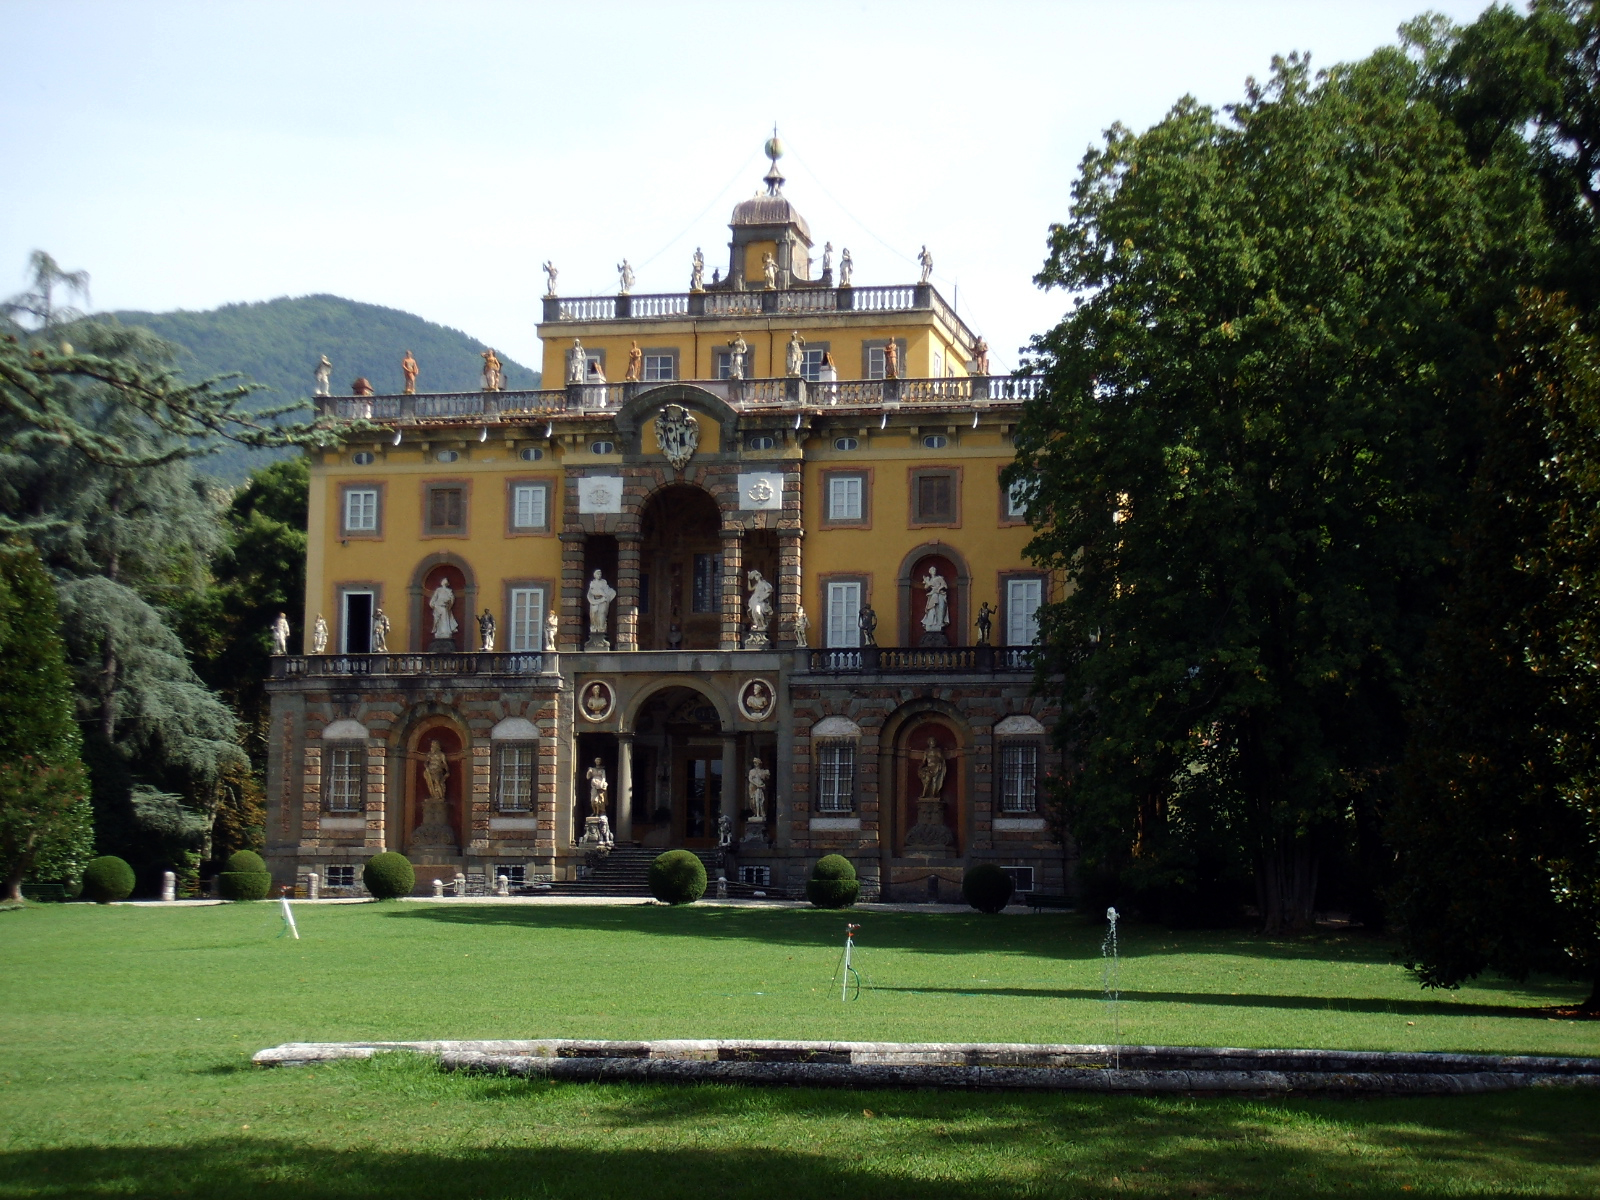 Villa Dei Fiori Acerra Dott Montano Luigi Camera Iperbarica